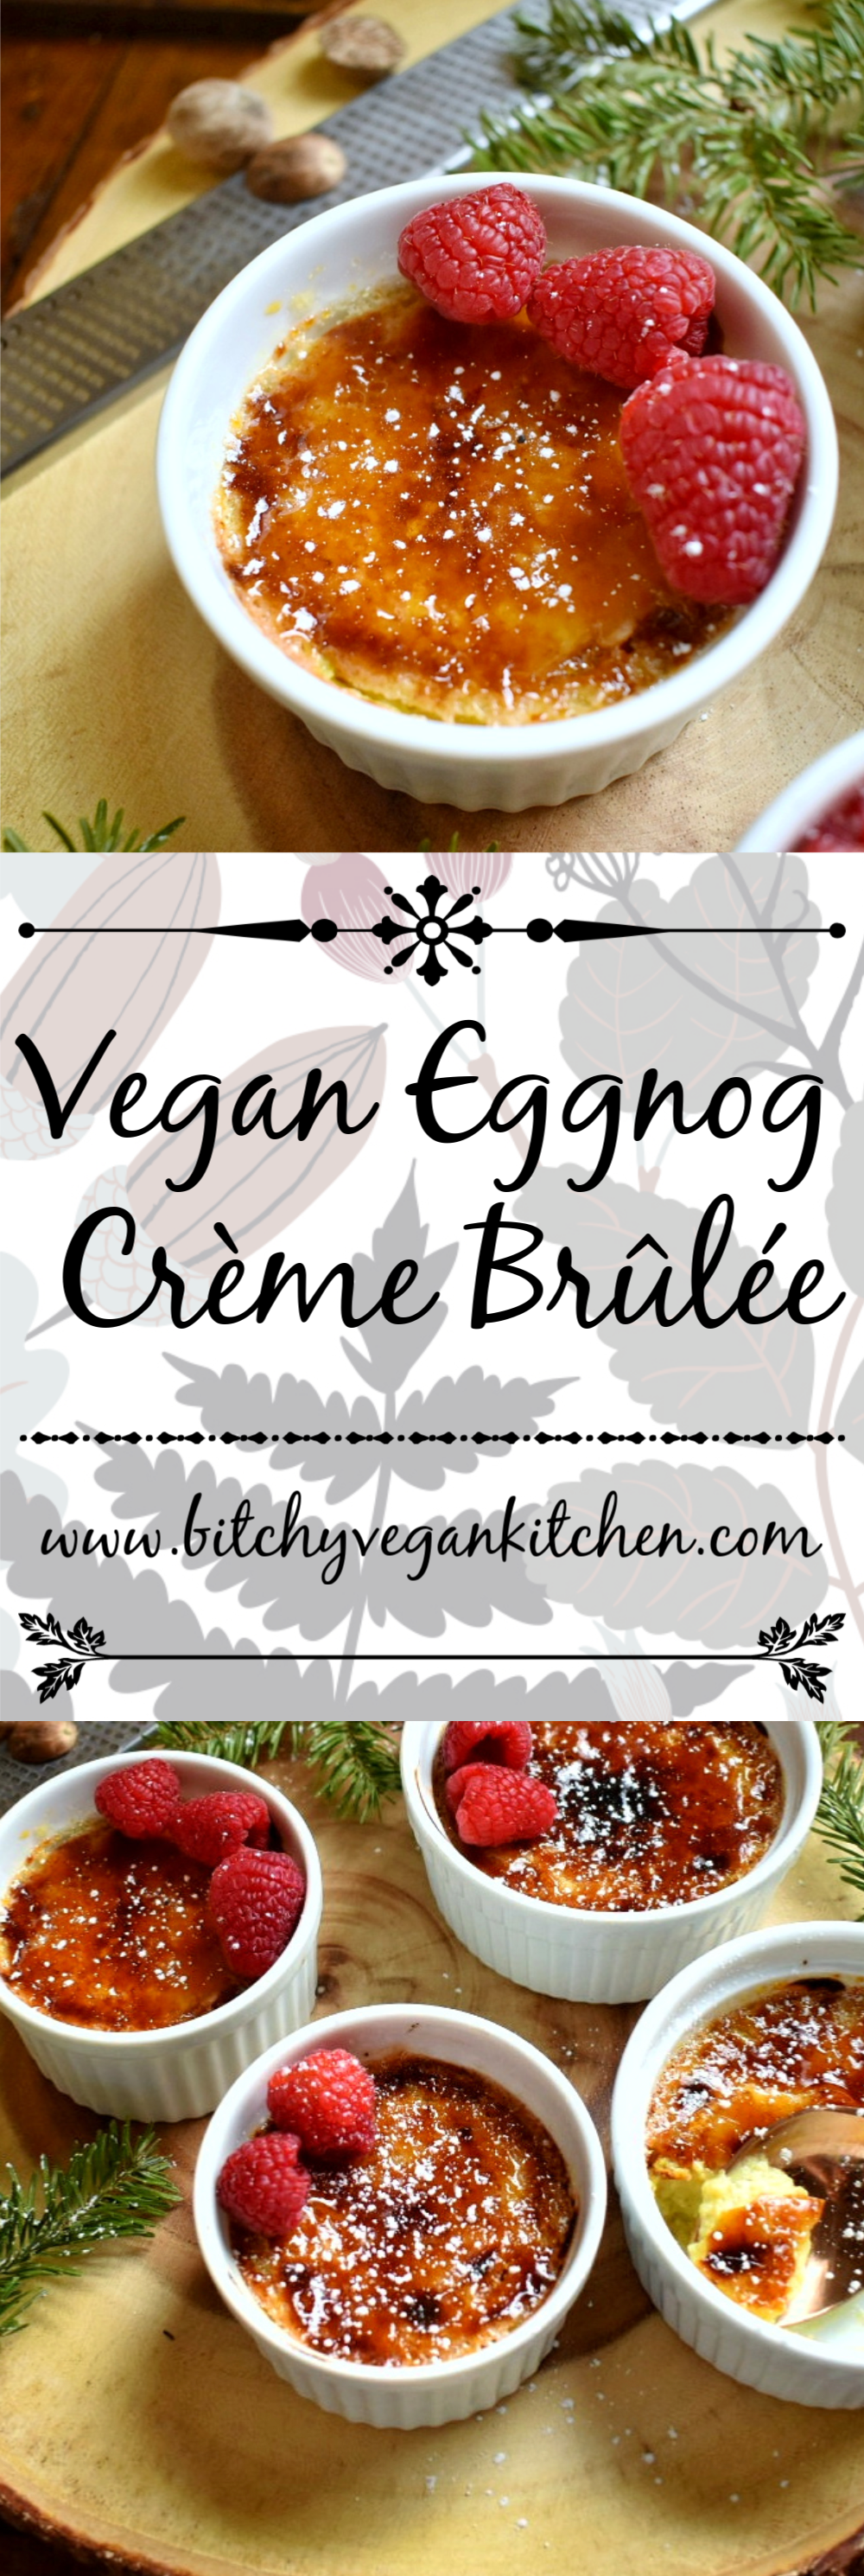 Vegan Eggnog Crème Brûlée - The Bitchy Baker